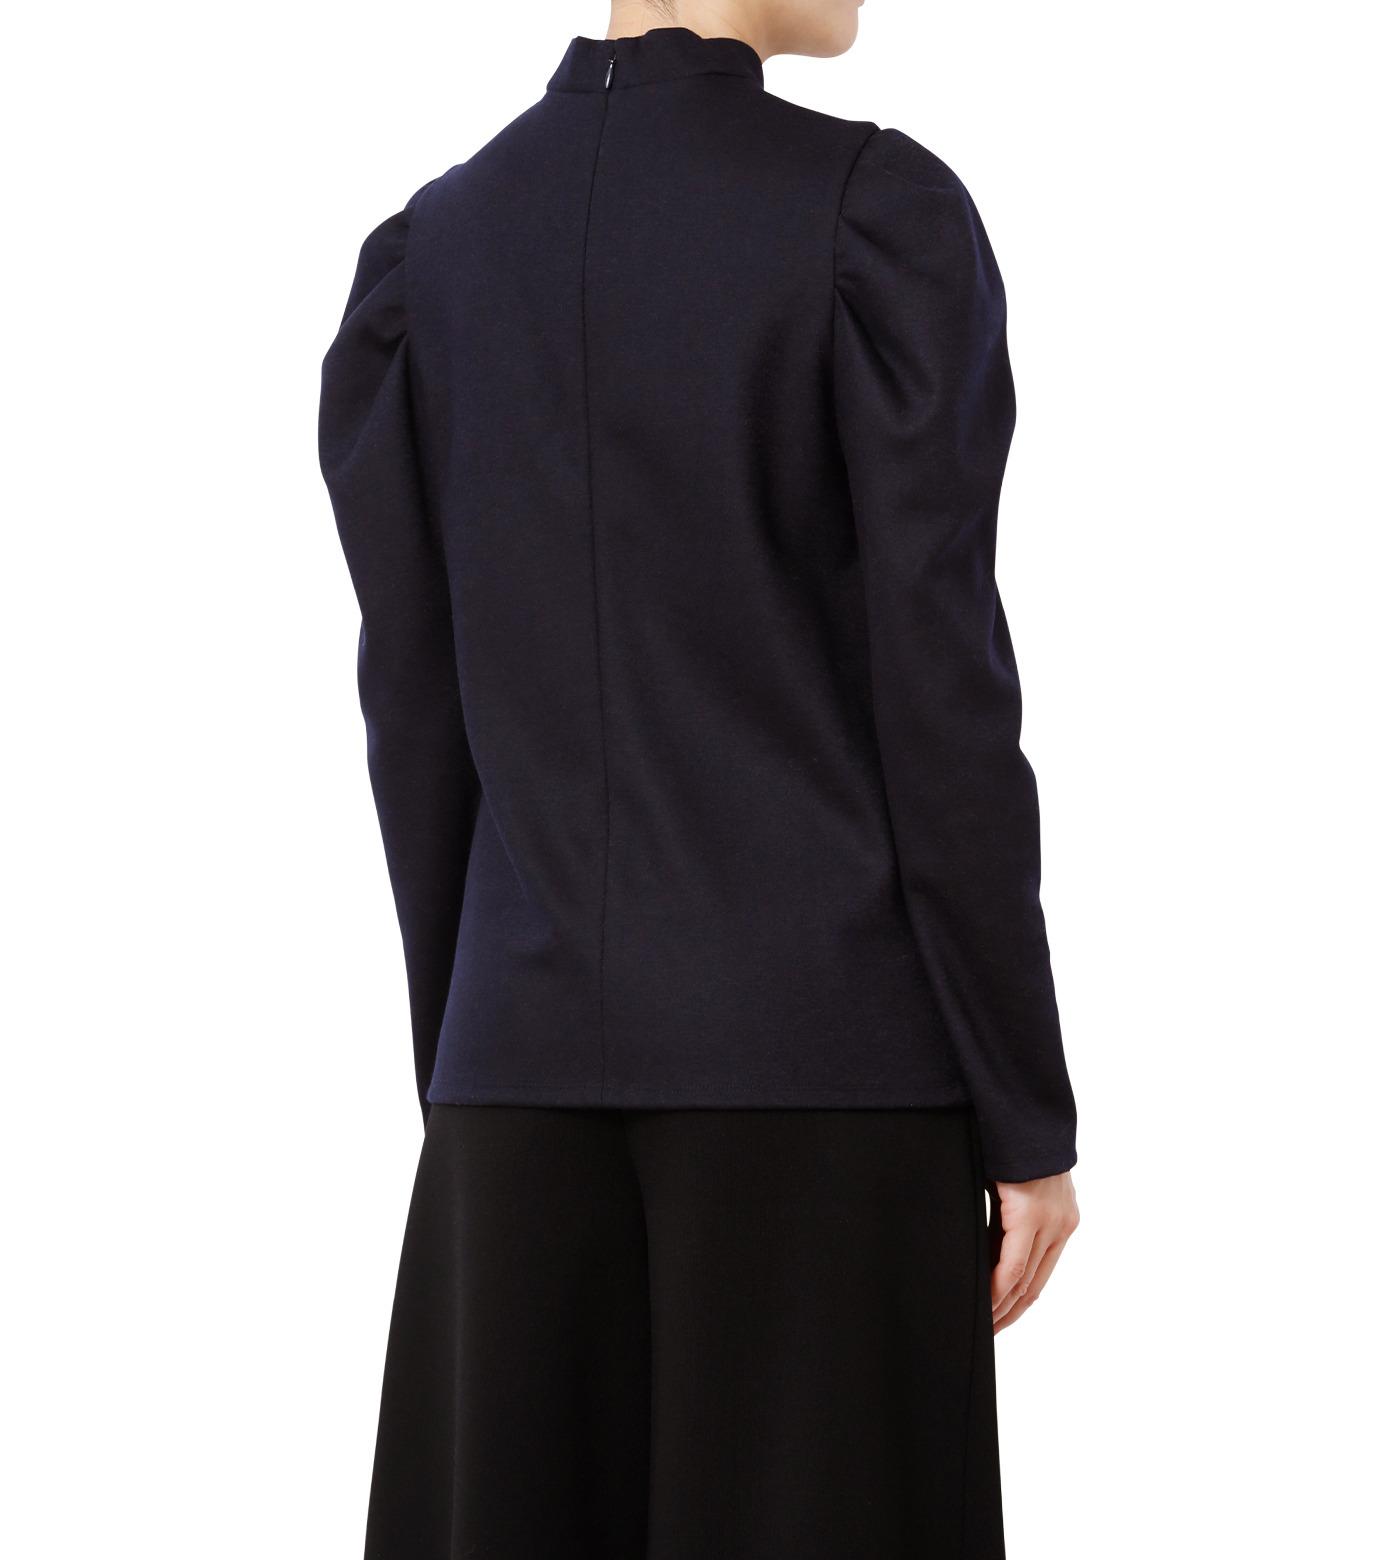 LE CIEL BLEU(ルシェルブルー)のパフカットトップス-NAVY(カットソー/cut and sewn)-18A62514 拡大詳細画像2